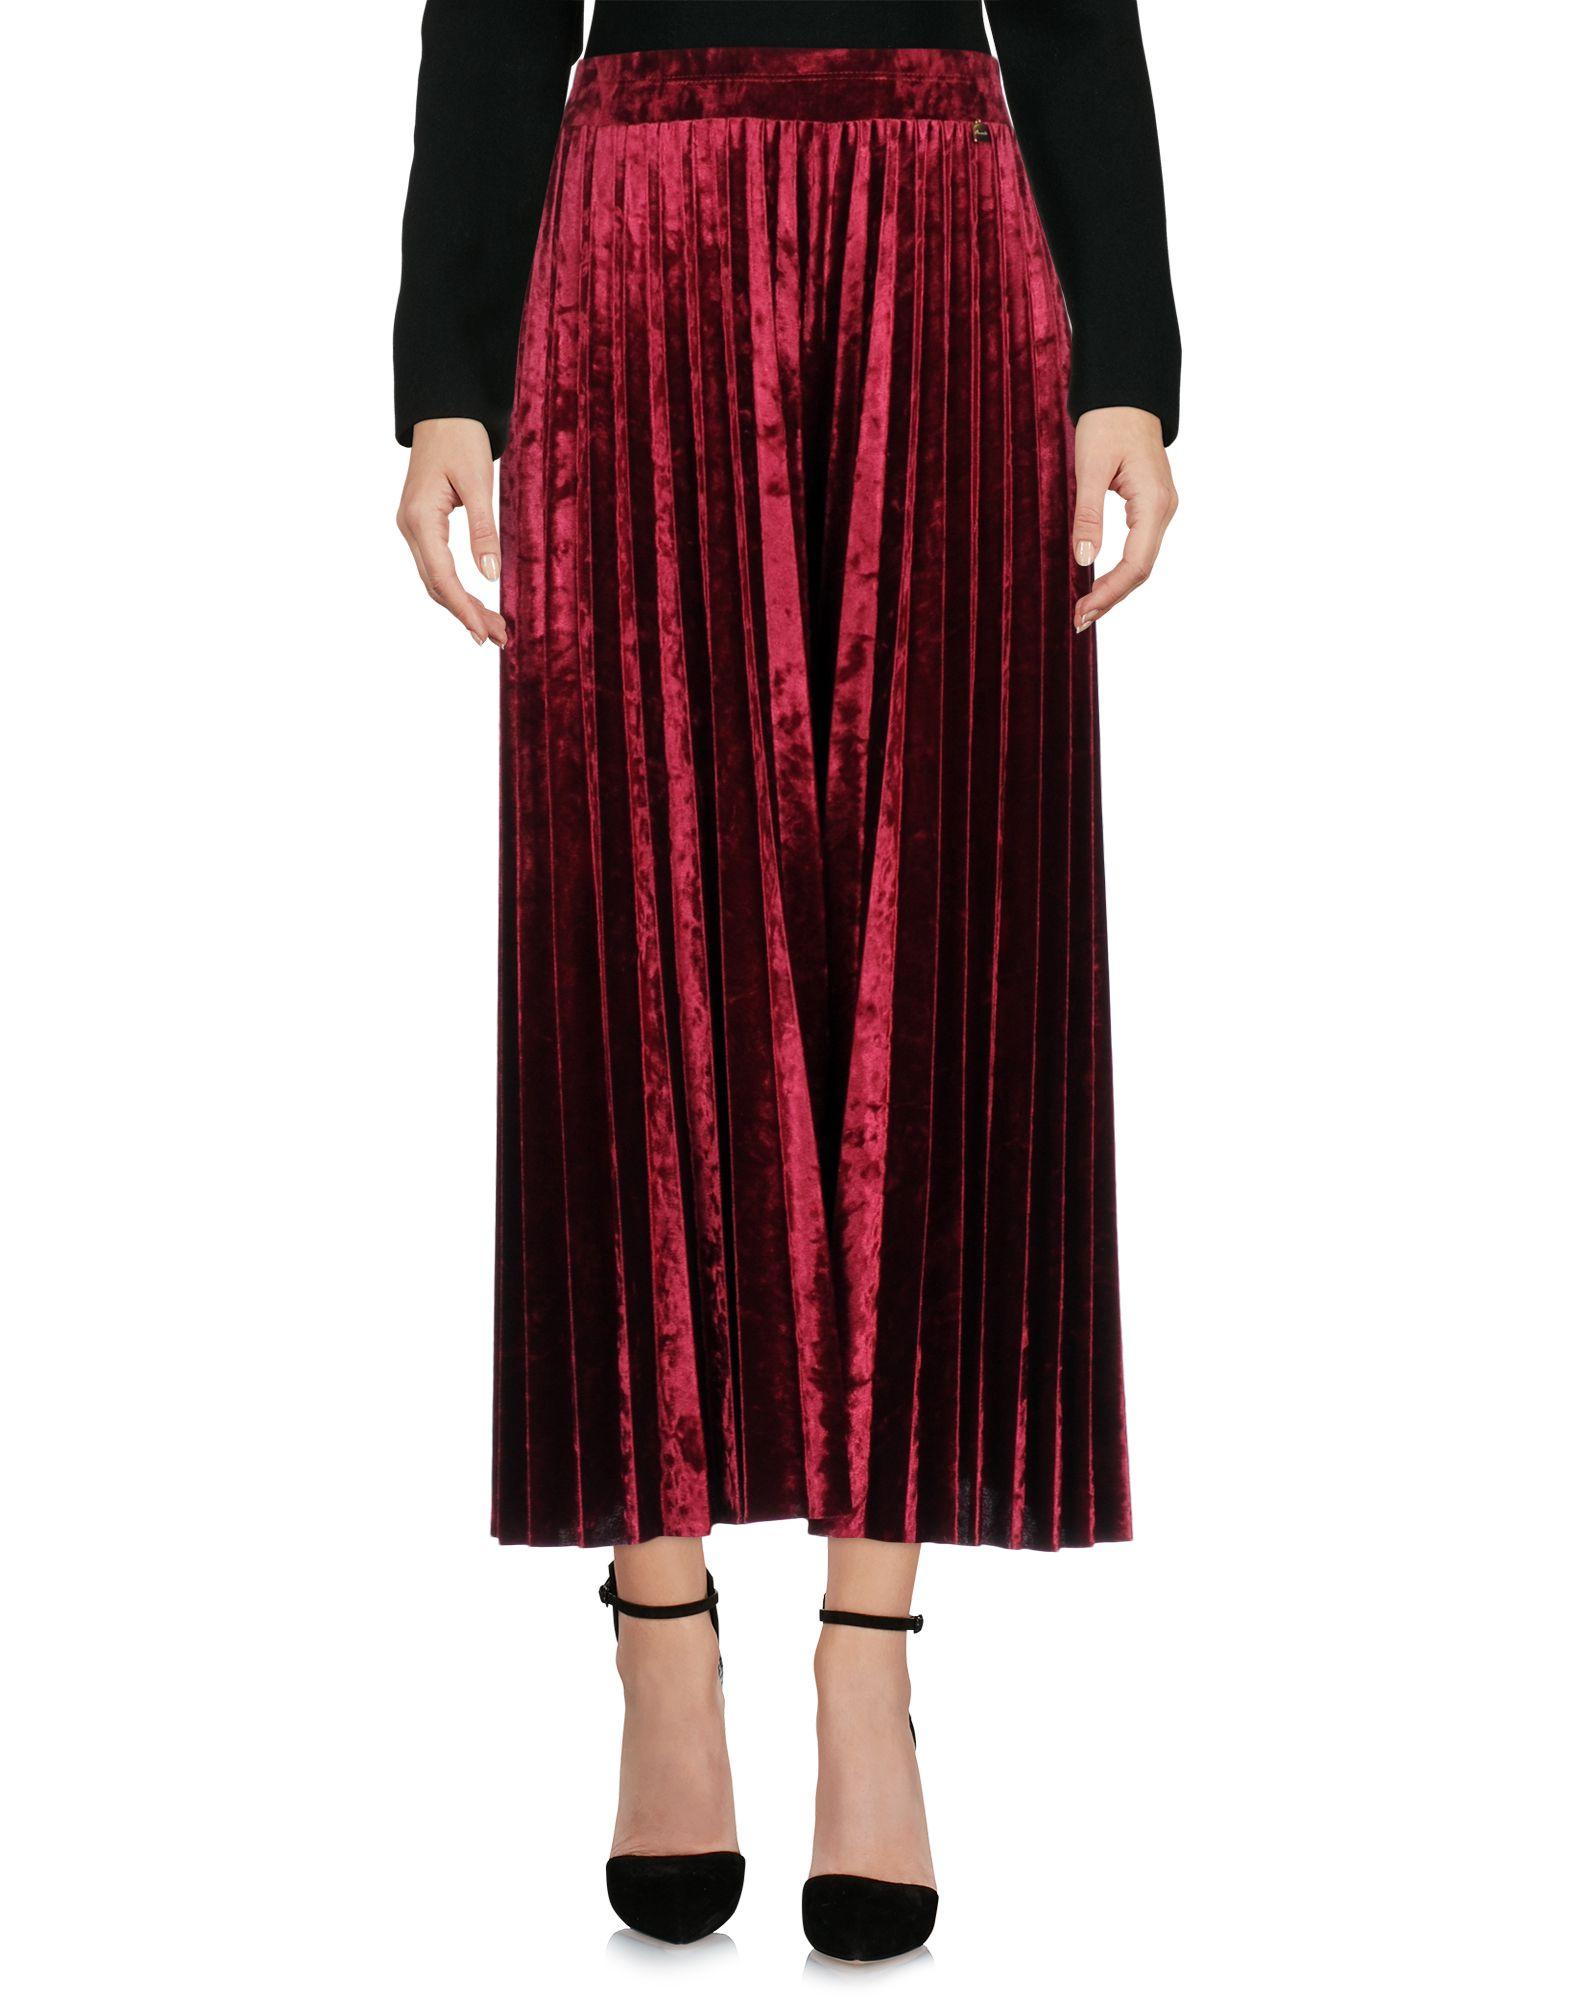 SOUVENIR Юбка длиной 3/4 юбка брюки плиссе